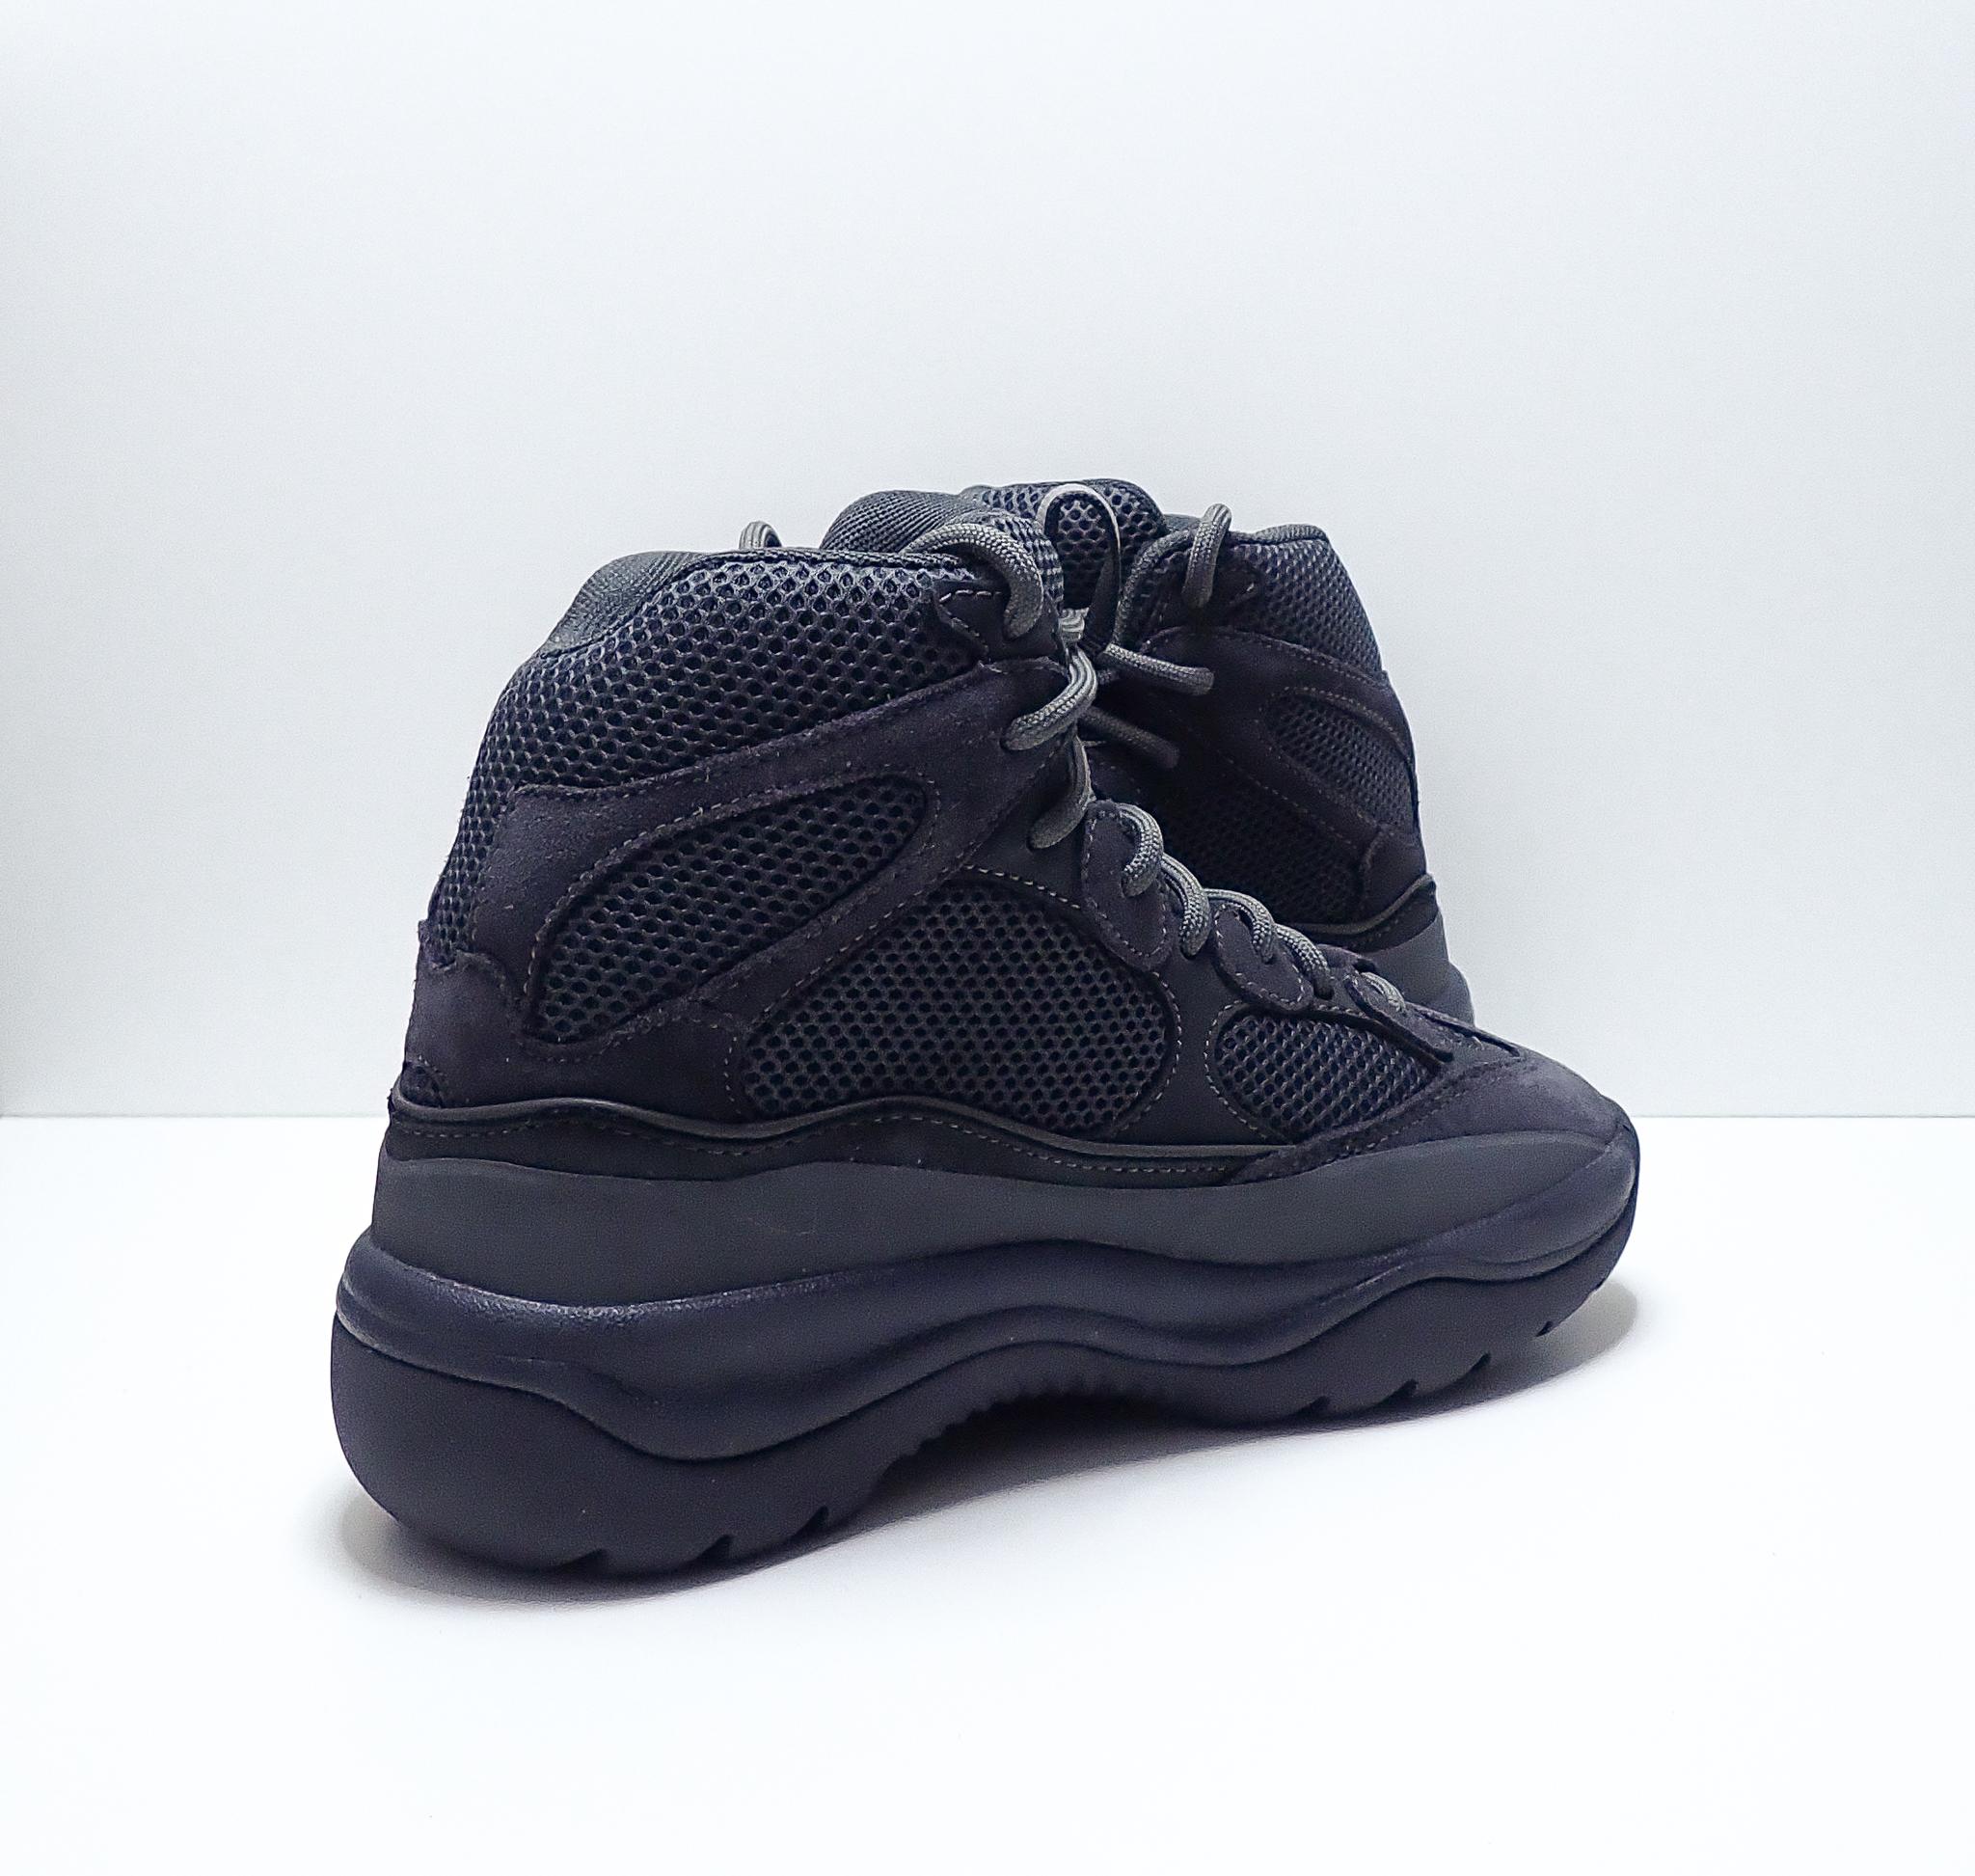 Yeezy Season 6 Suede Desert Boot Graphite